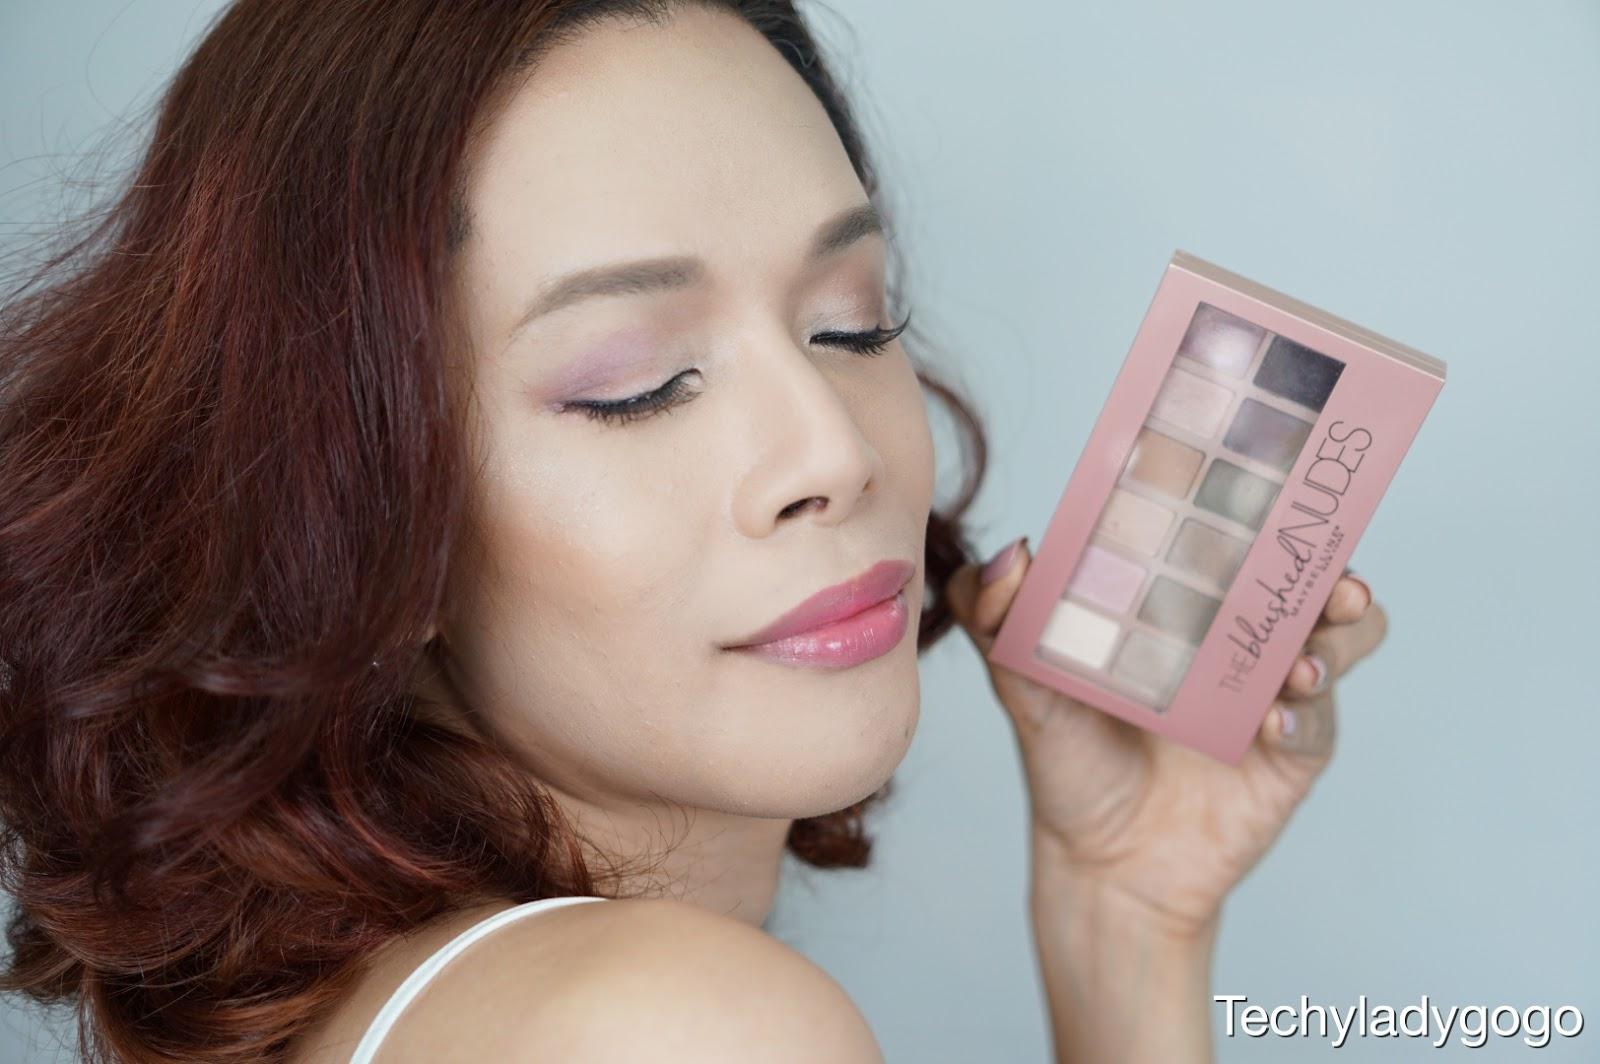 Techyladygogo รีวิว Maybelline The Blushed Nudes Eyeshadow Palette อายแชโดว์โทนนู้ดชมพู 12 เฉดสี โรสโกลด์